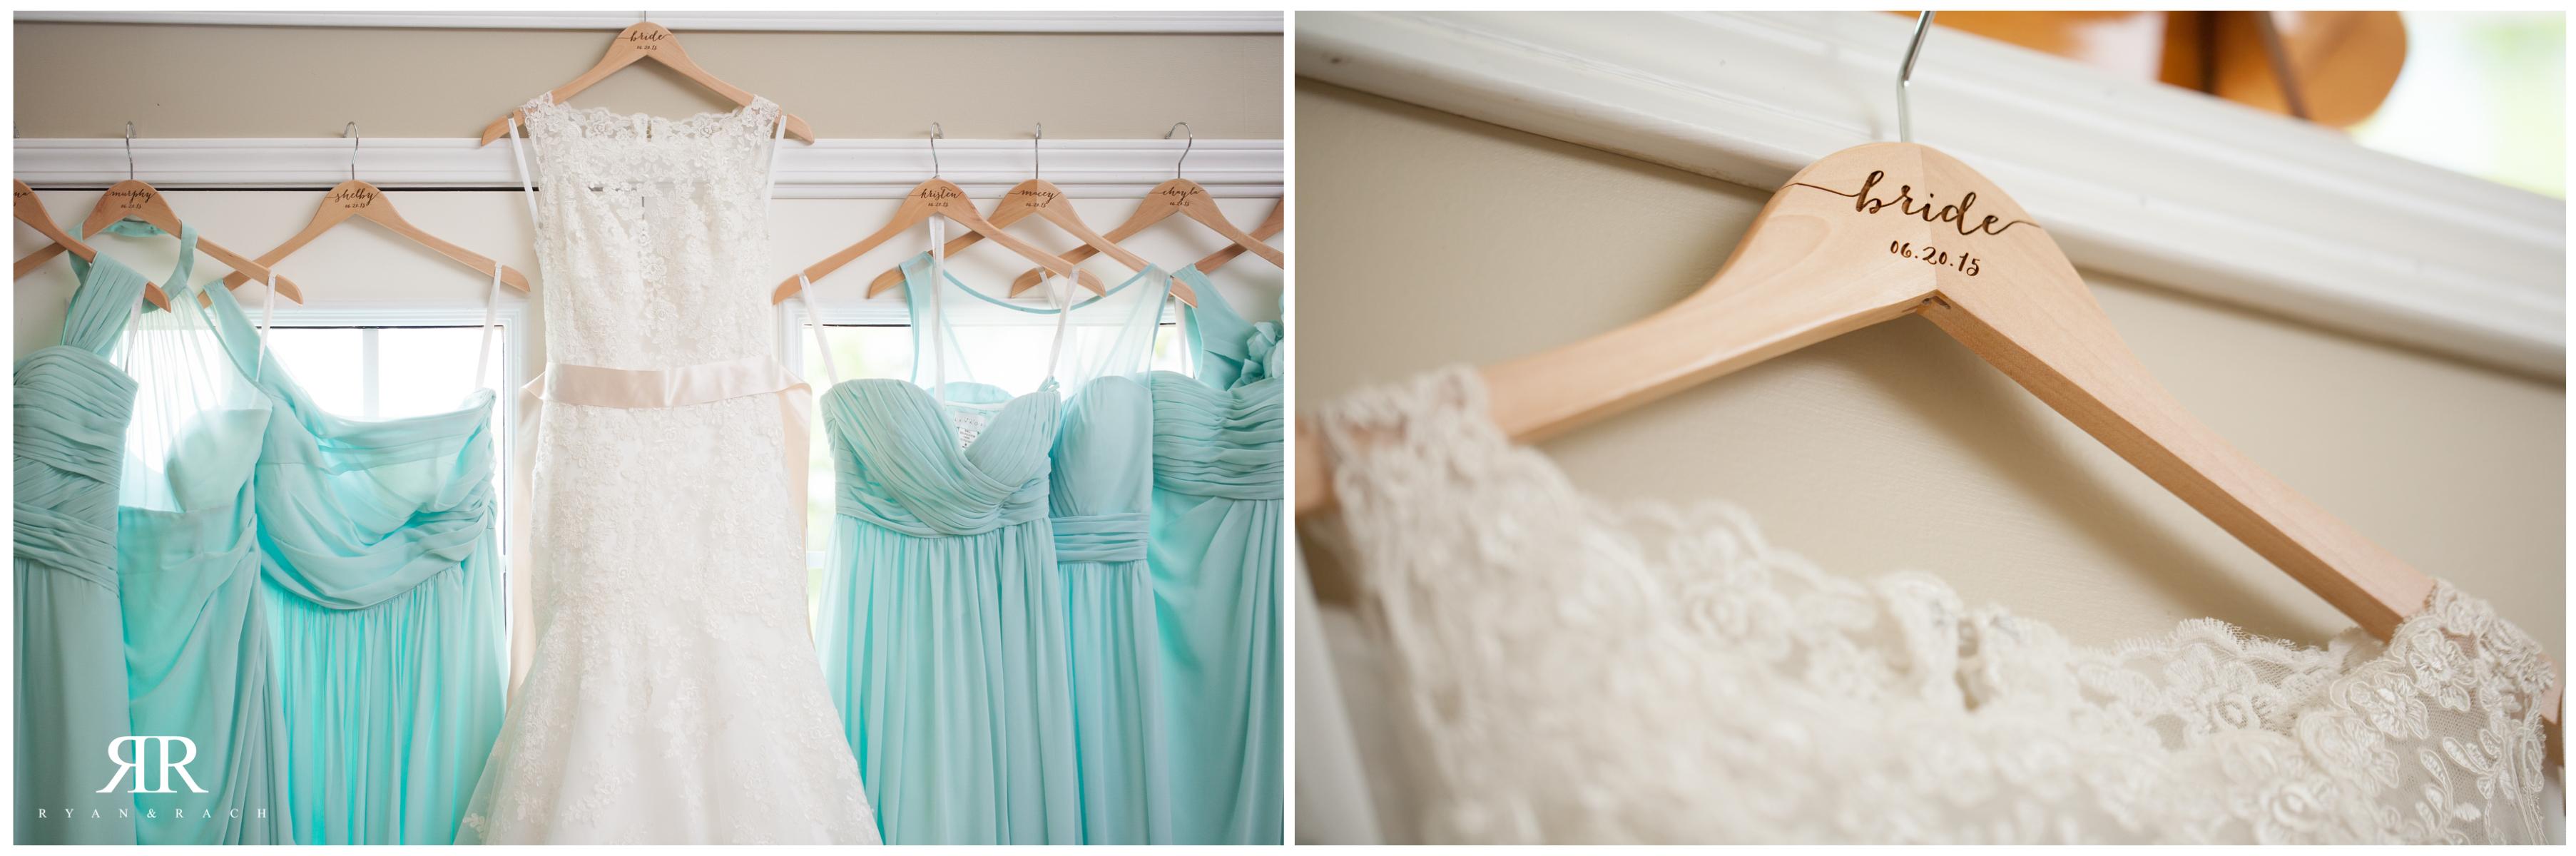 Cheran & Christopher   Neuse Breeze Wedding   Emerald Isle, NC